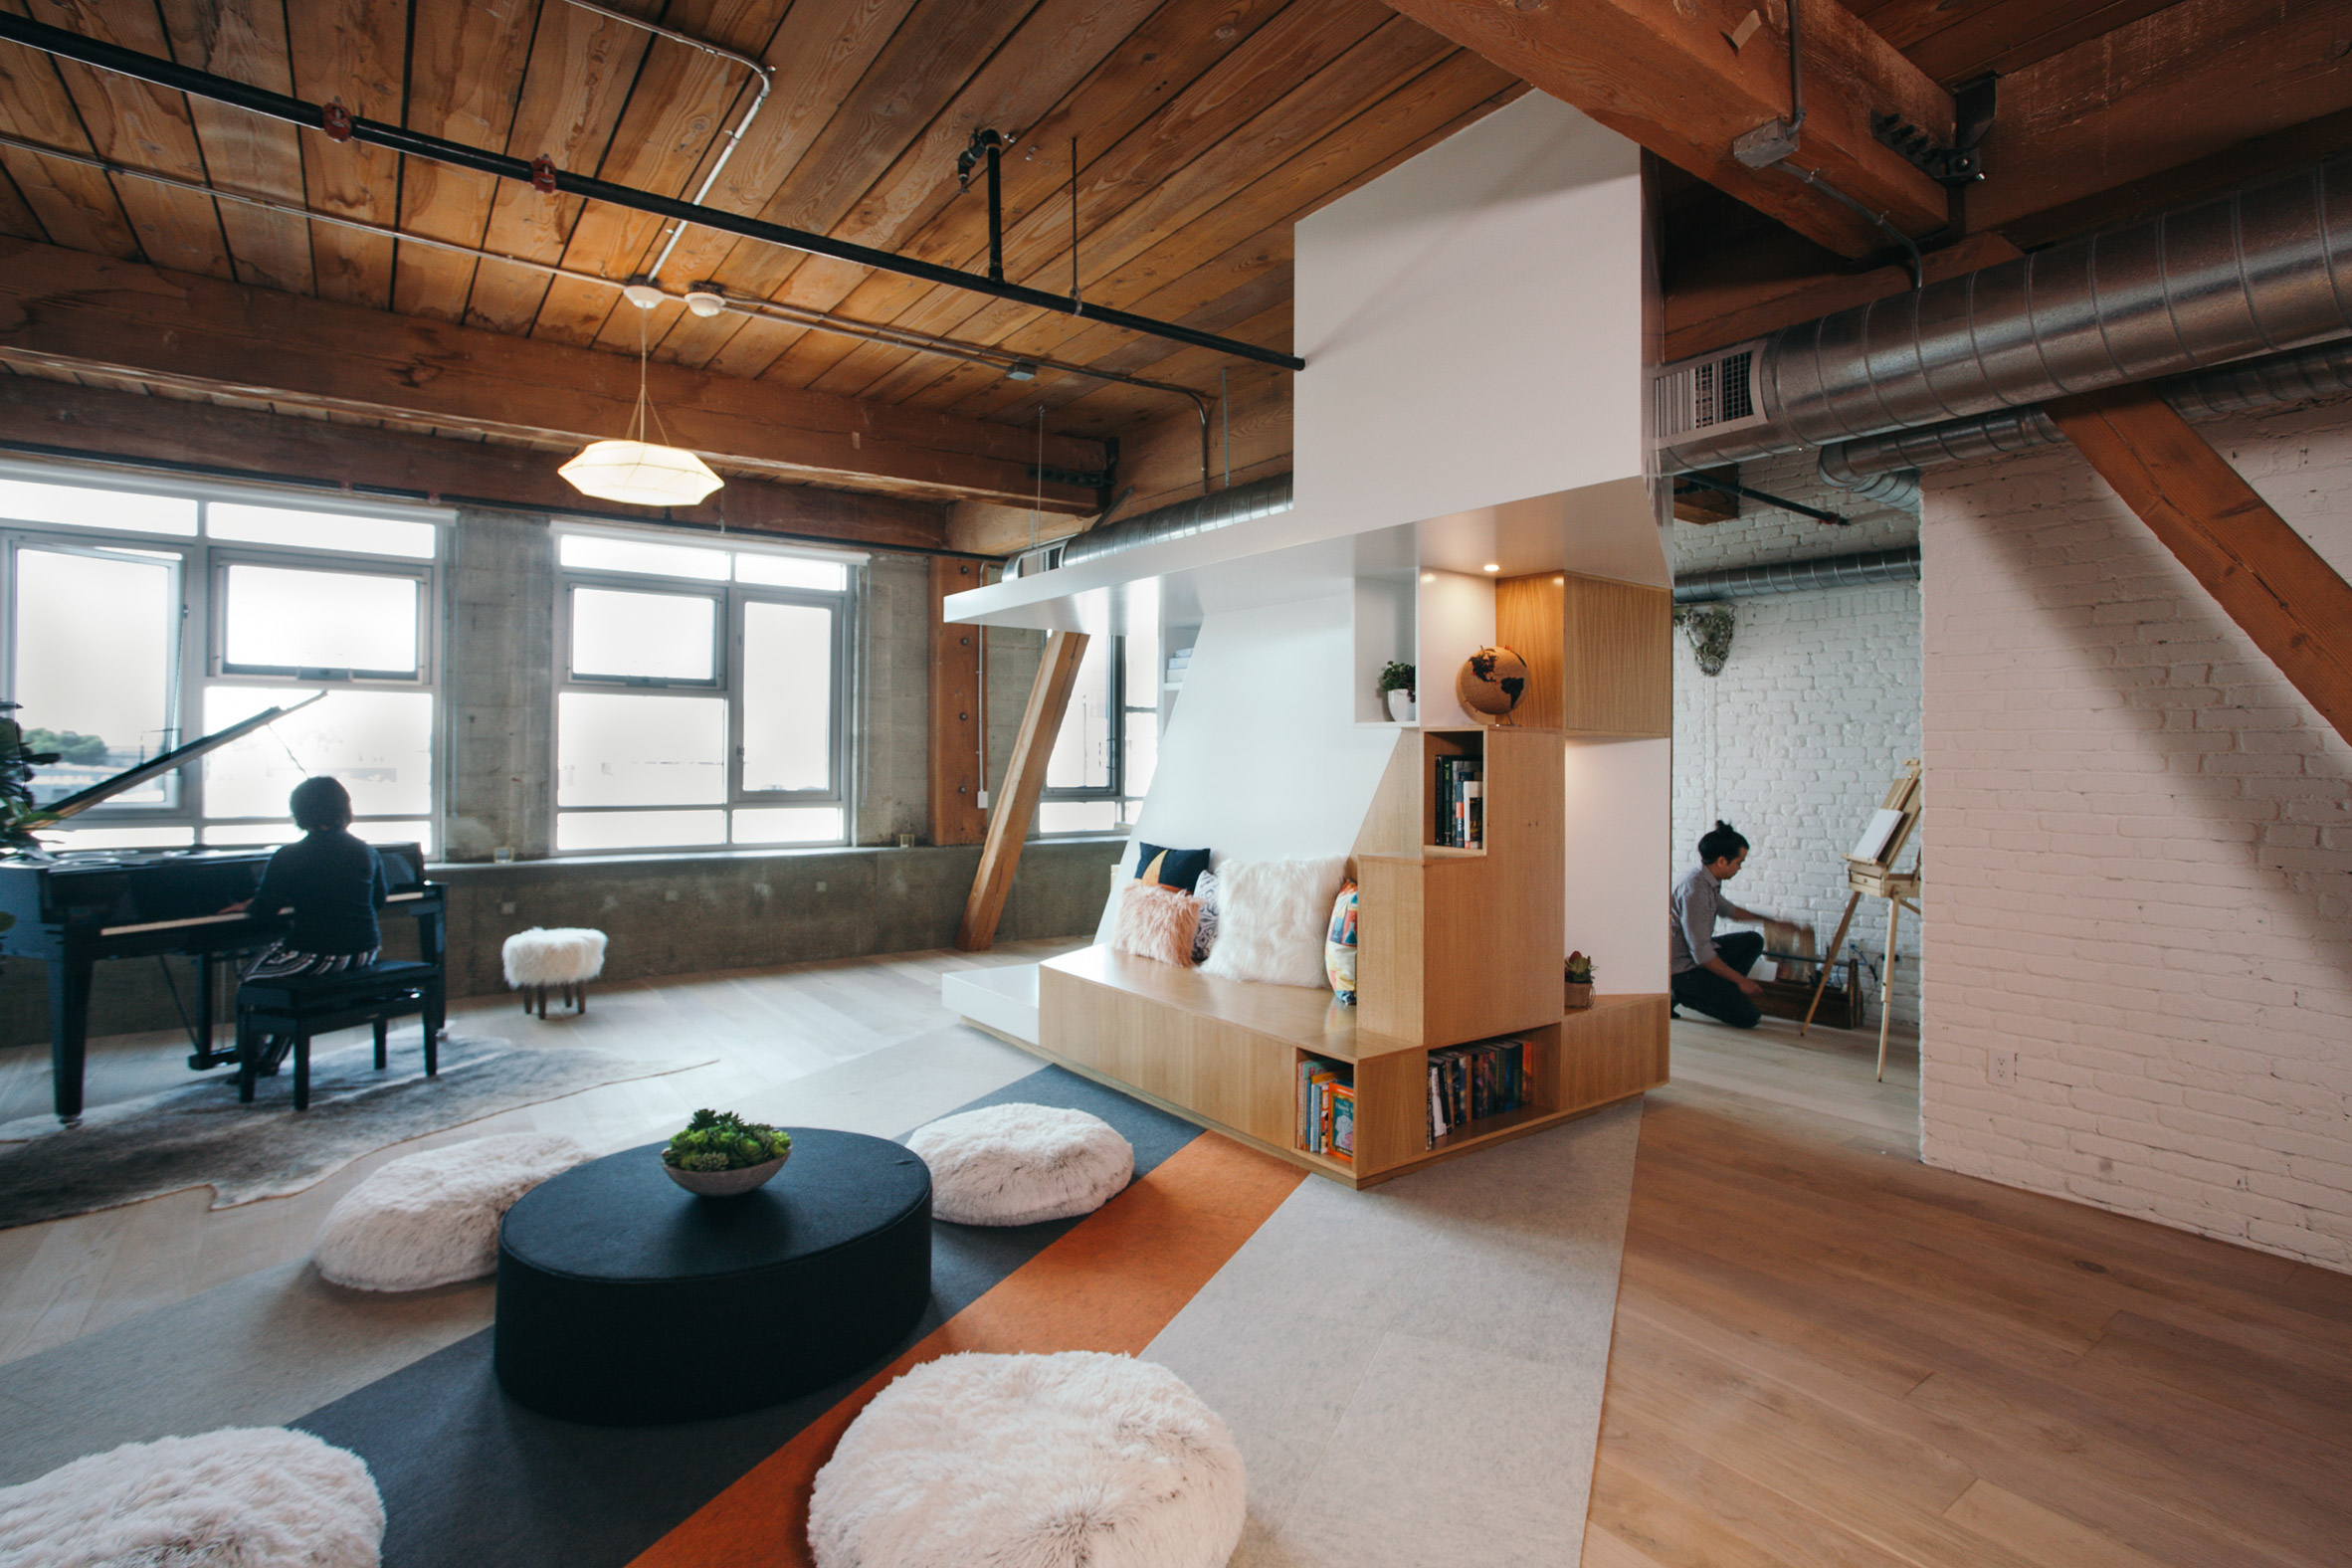 architecture-loft-interior-design-studia-osnovadesign-osnova-poltava_03